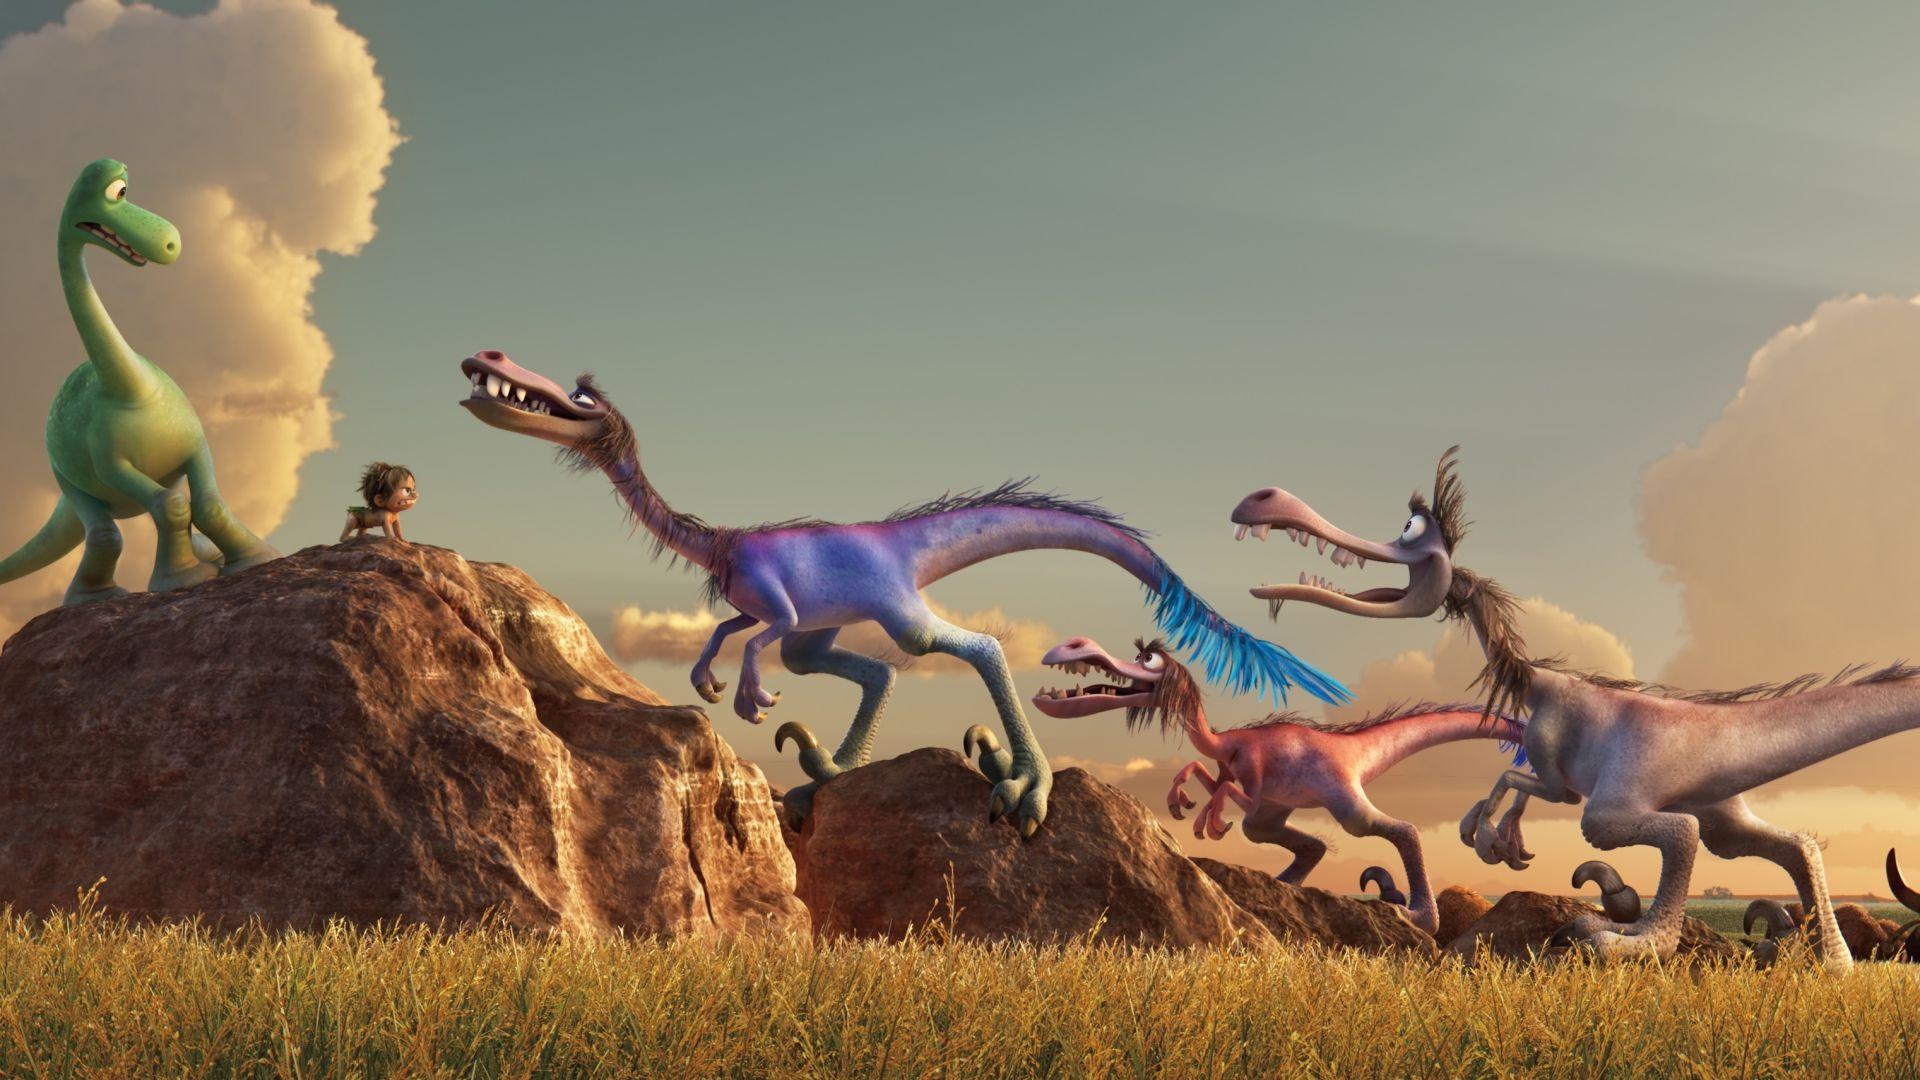 The Good Dinosaur Wallpaper Movies Animation The Good